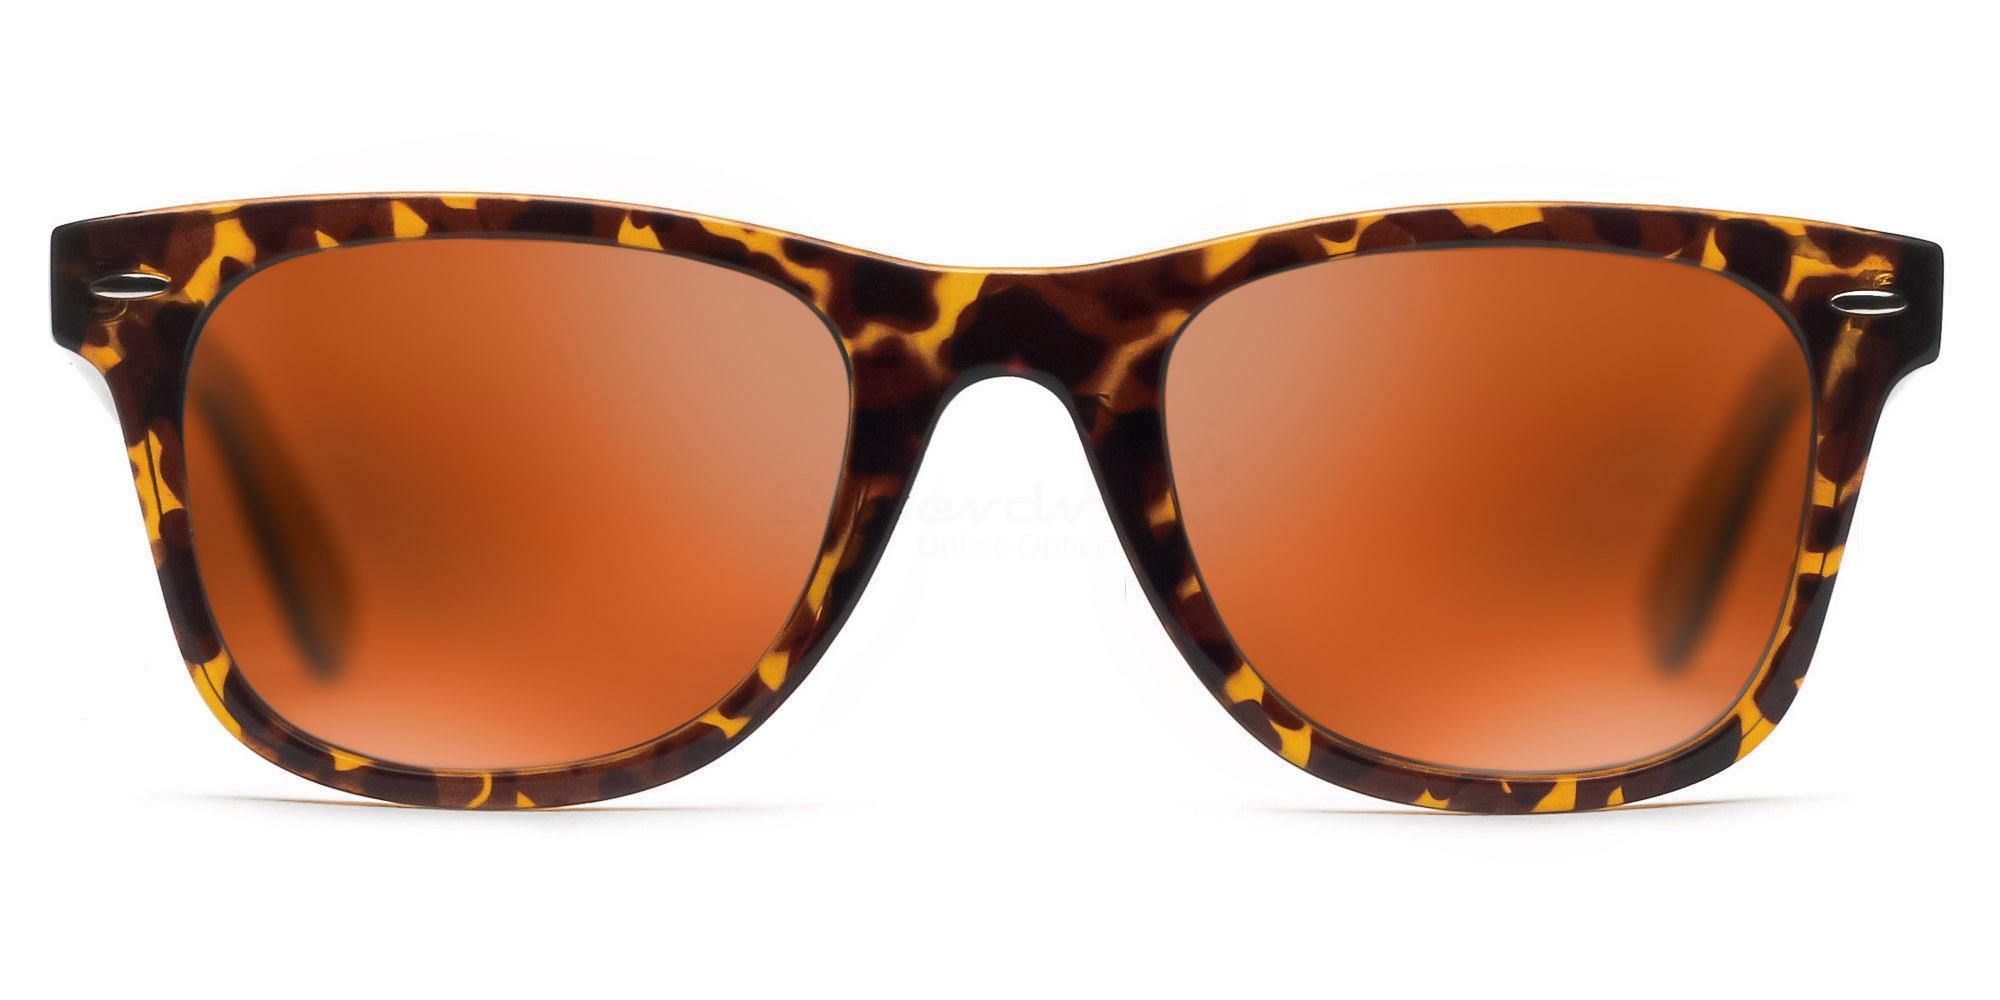 C04 Polarized Grey with Orange Mirror P2429 - Havana (Mirrored Polarized) , Neon